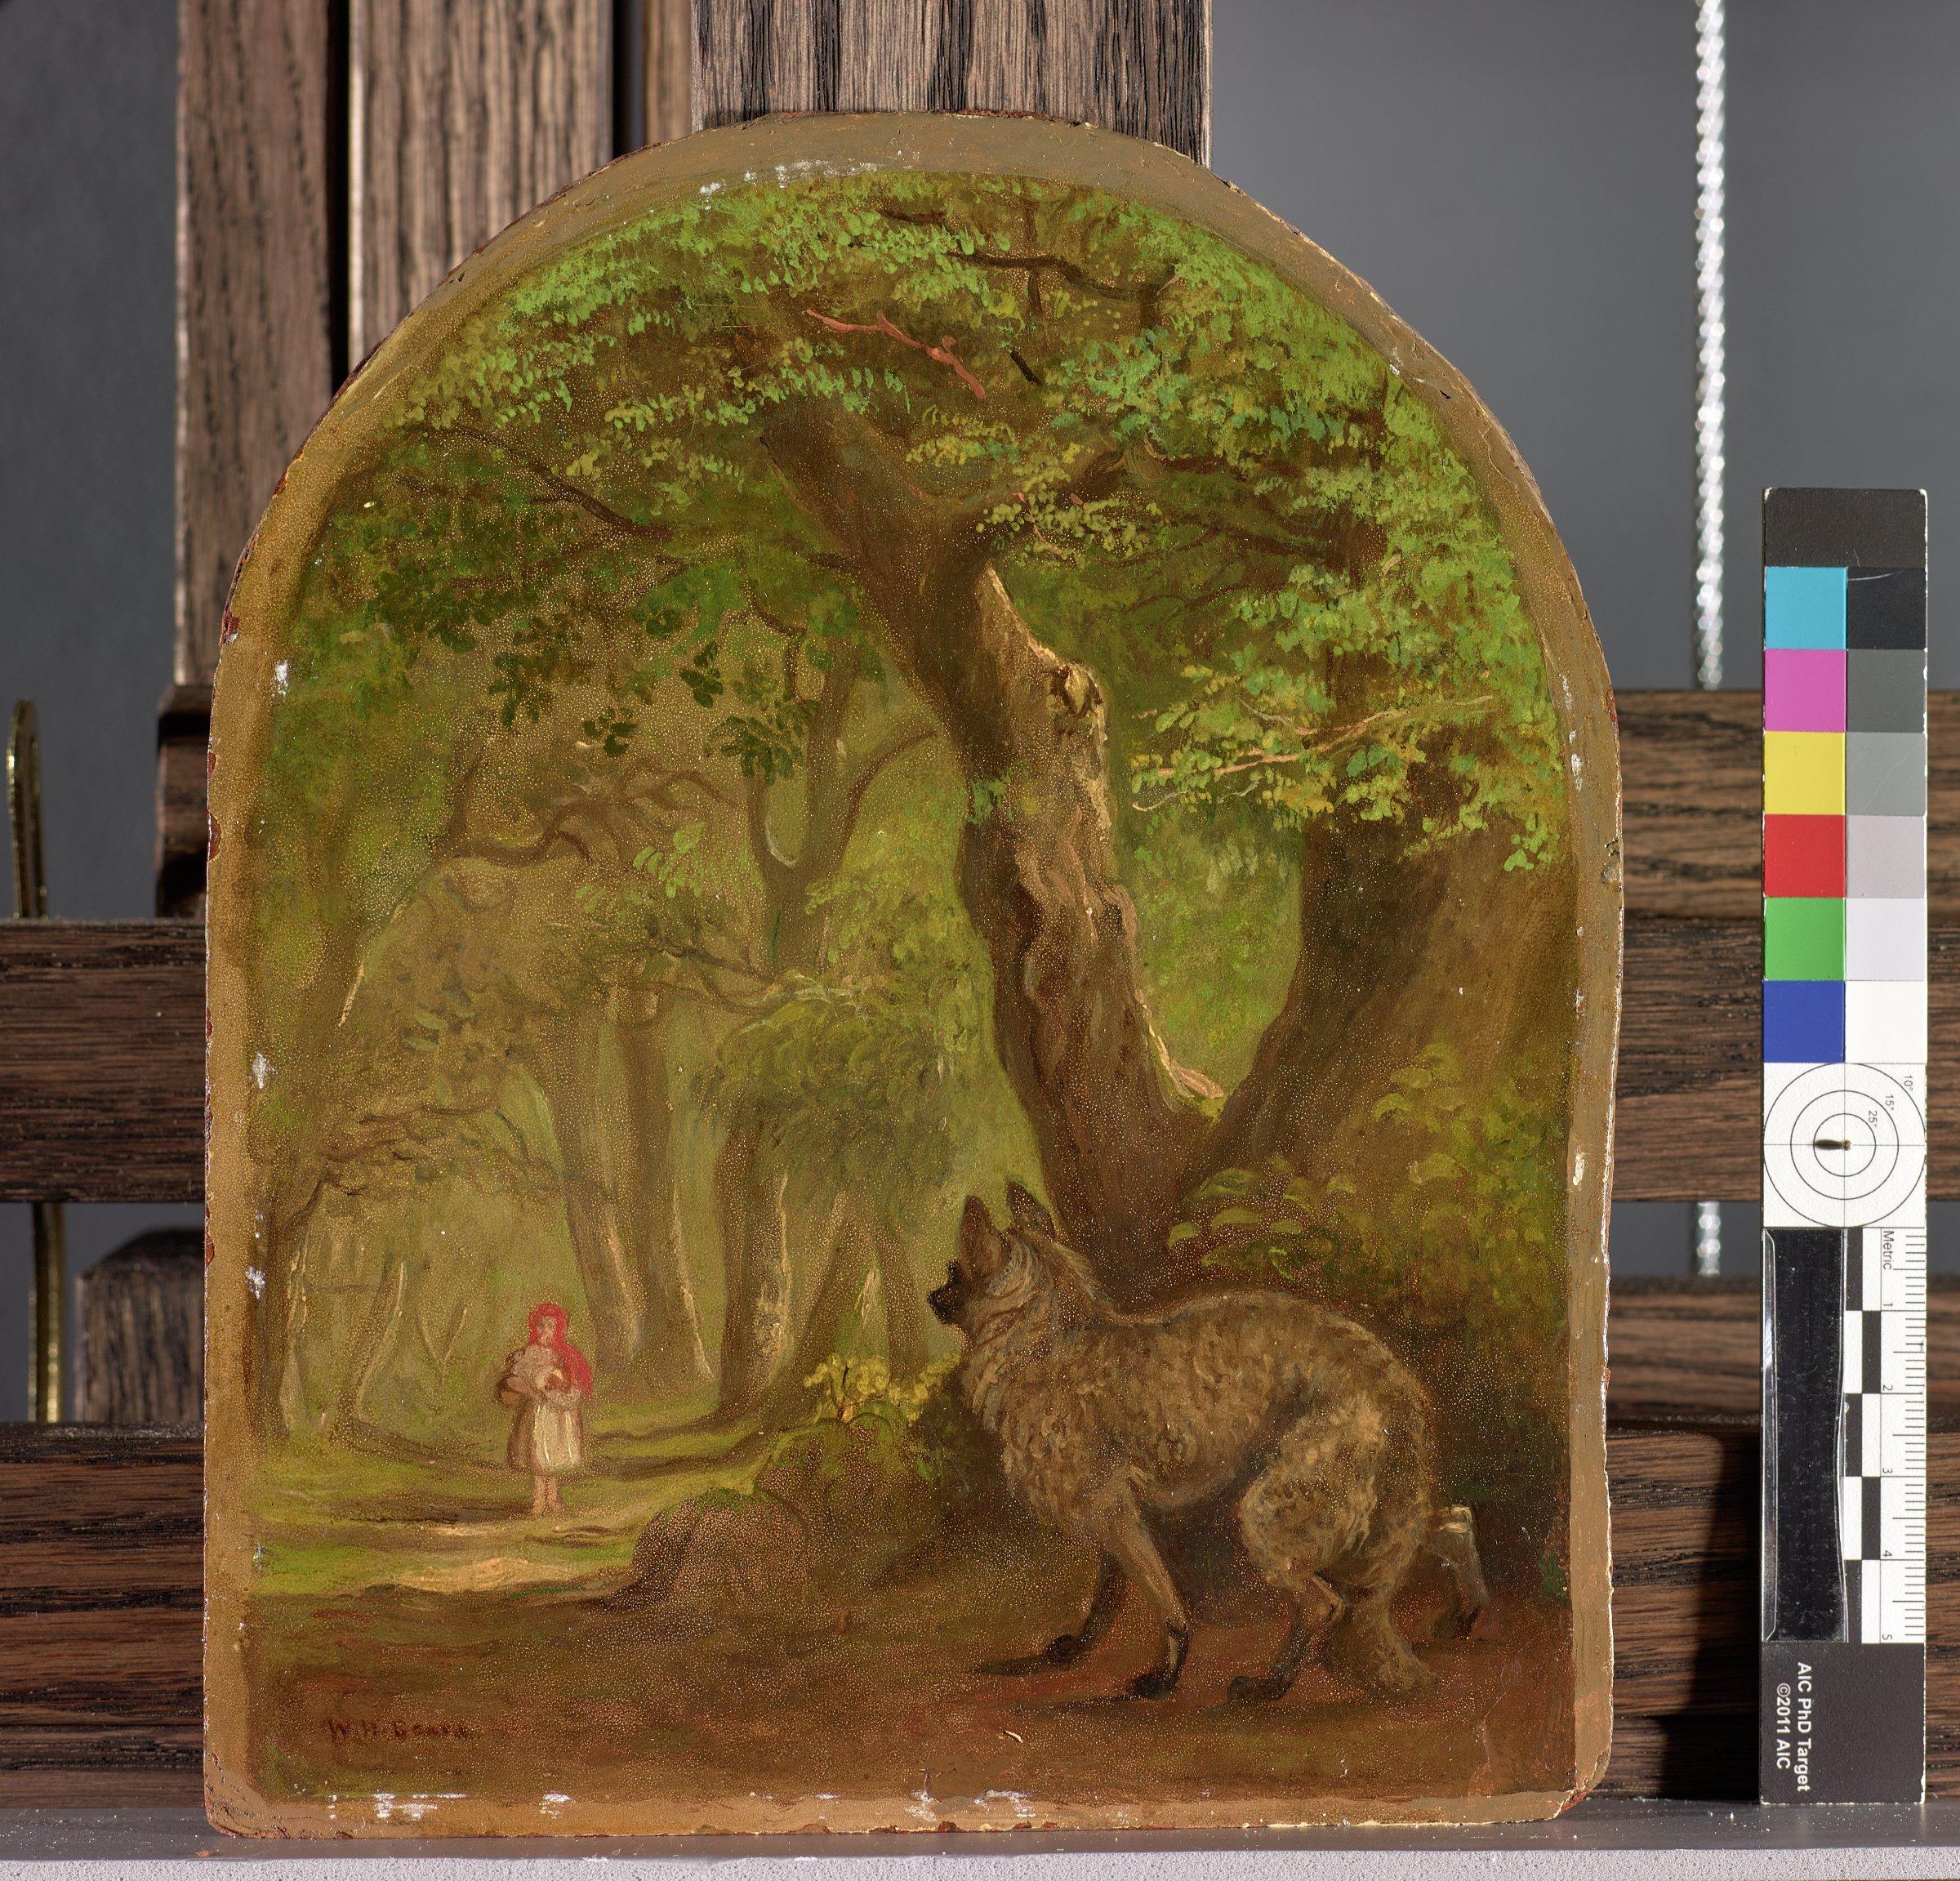 Little Red Riding Hood, William Holbrook Beard, oil on panel